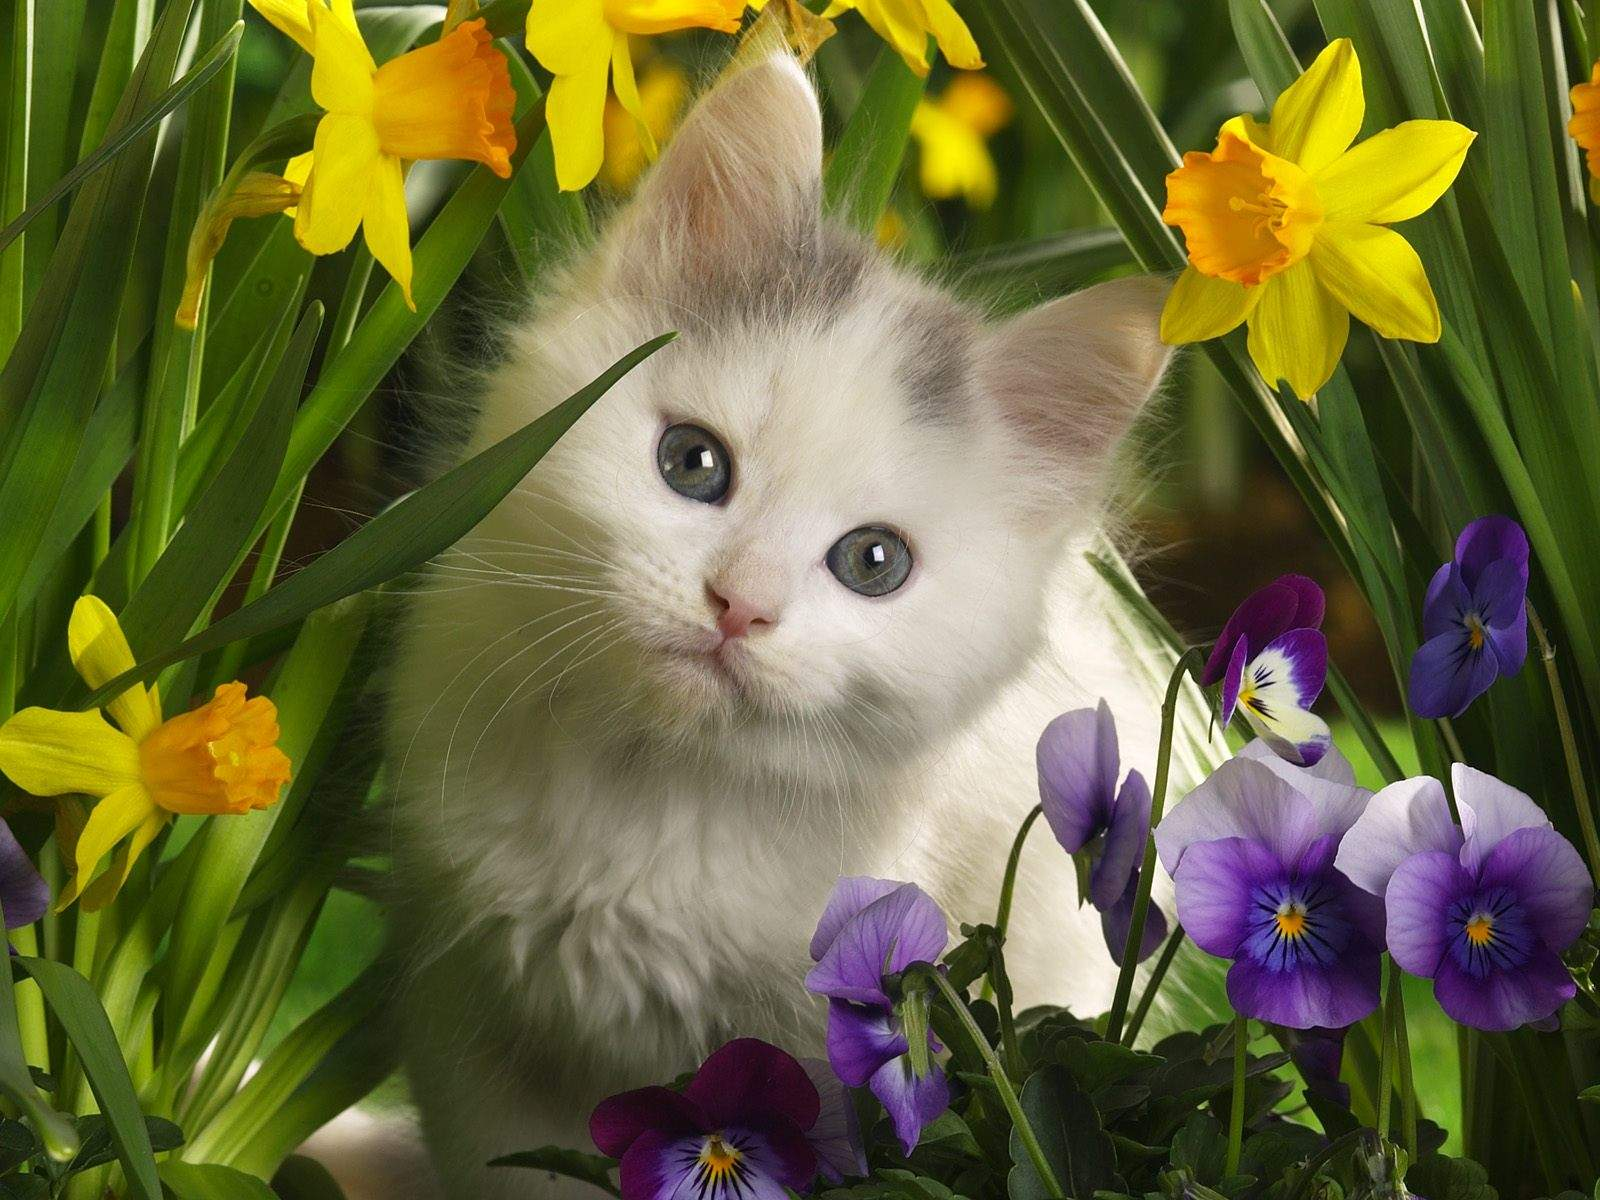 http://4.bp.blogspot.com/-LNhdVsL-ZaY/T9cZiPUxTtI/AAAAAAAAFm0/JAURp9lUdXU/s1600/cute-cates-wallpaper-02.jpg